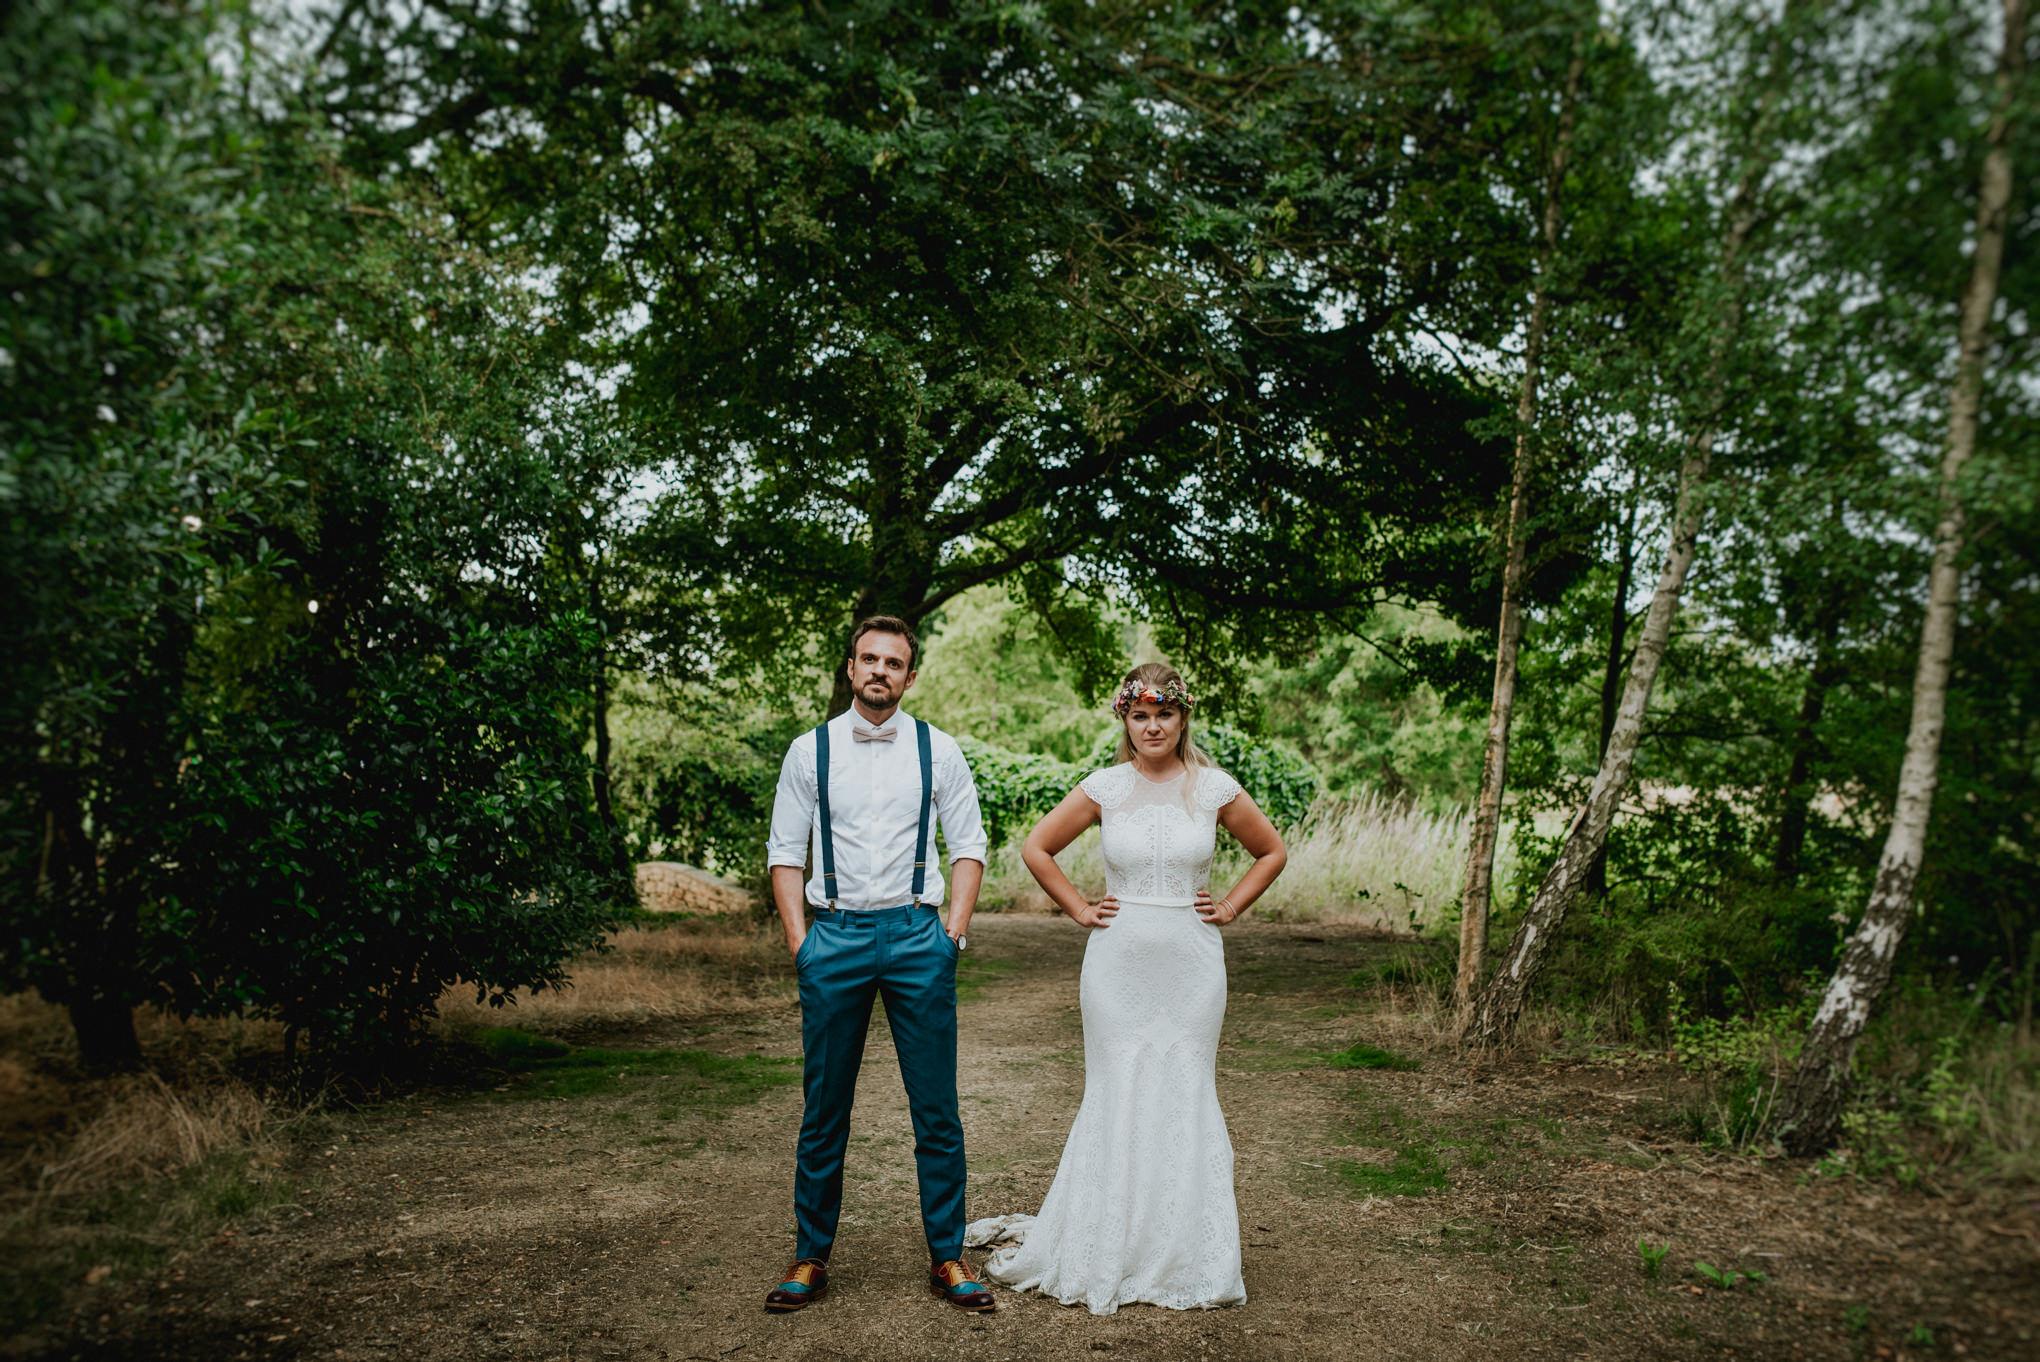 The Granary Deeping wedding